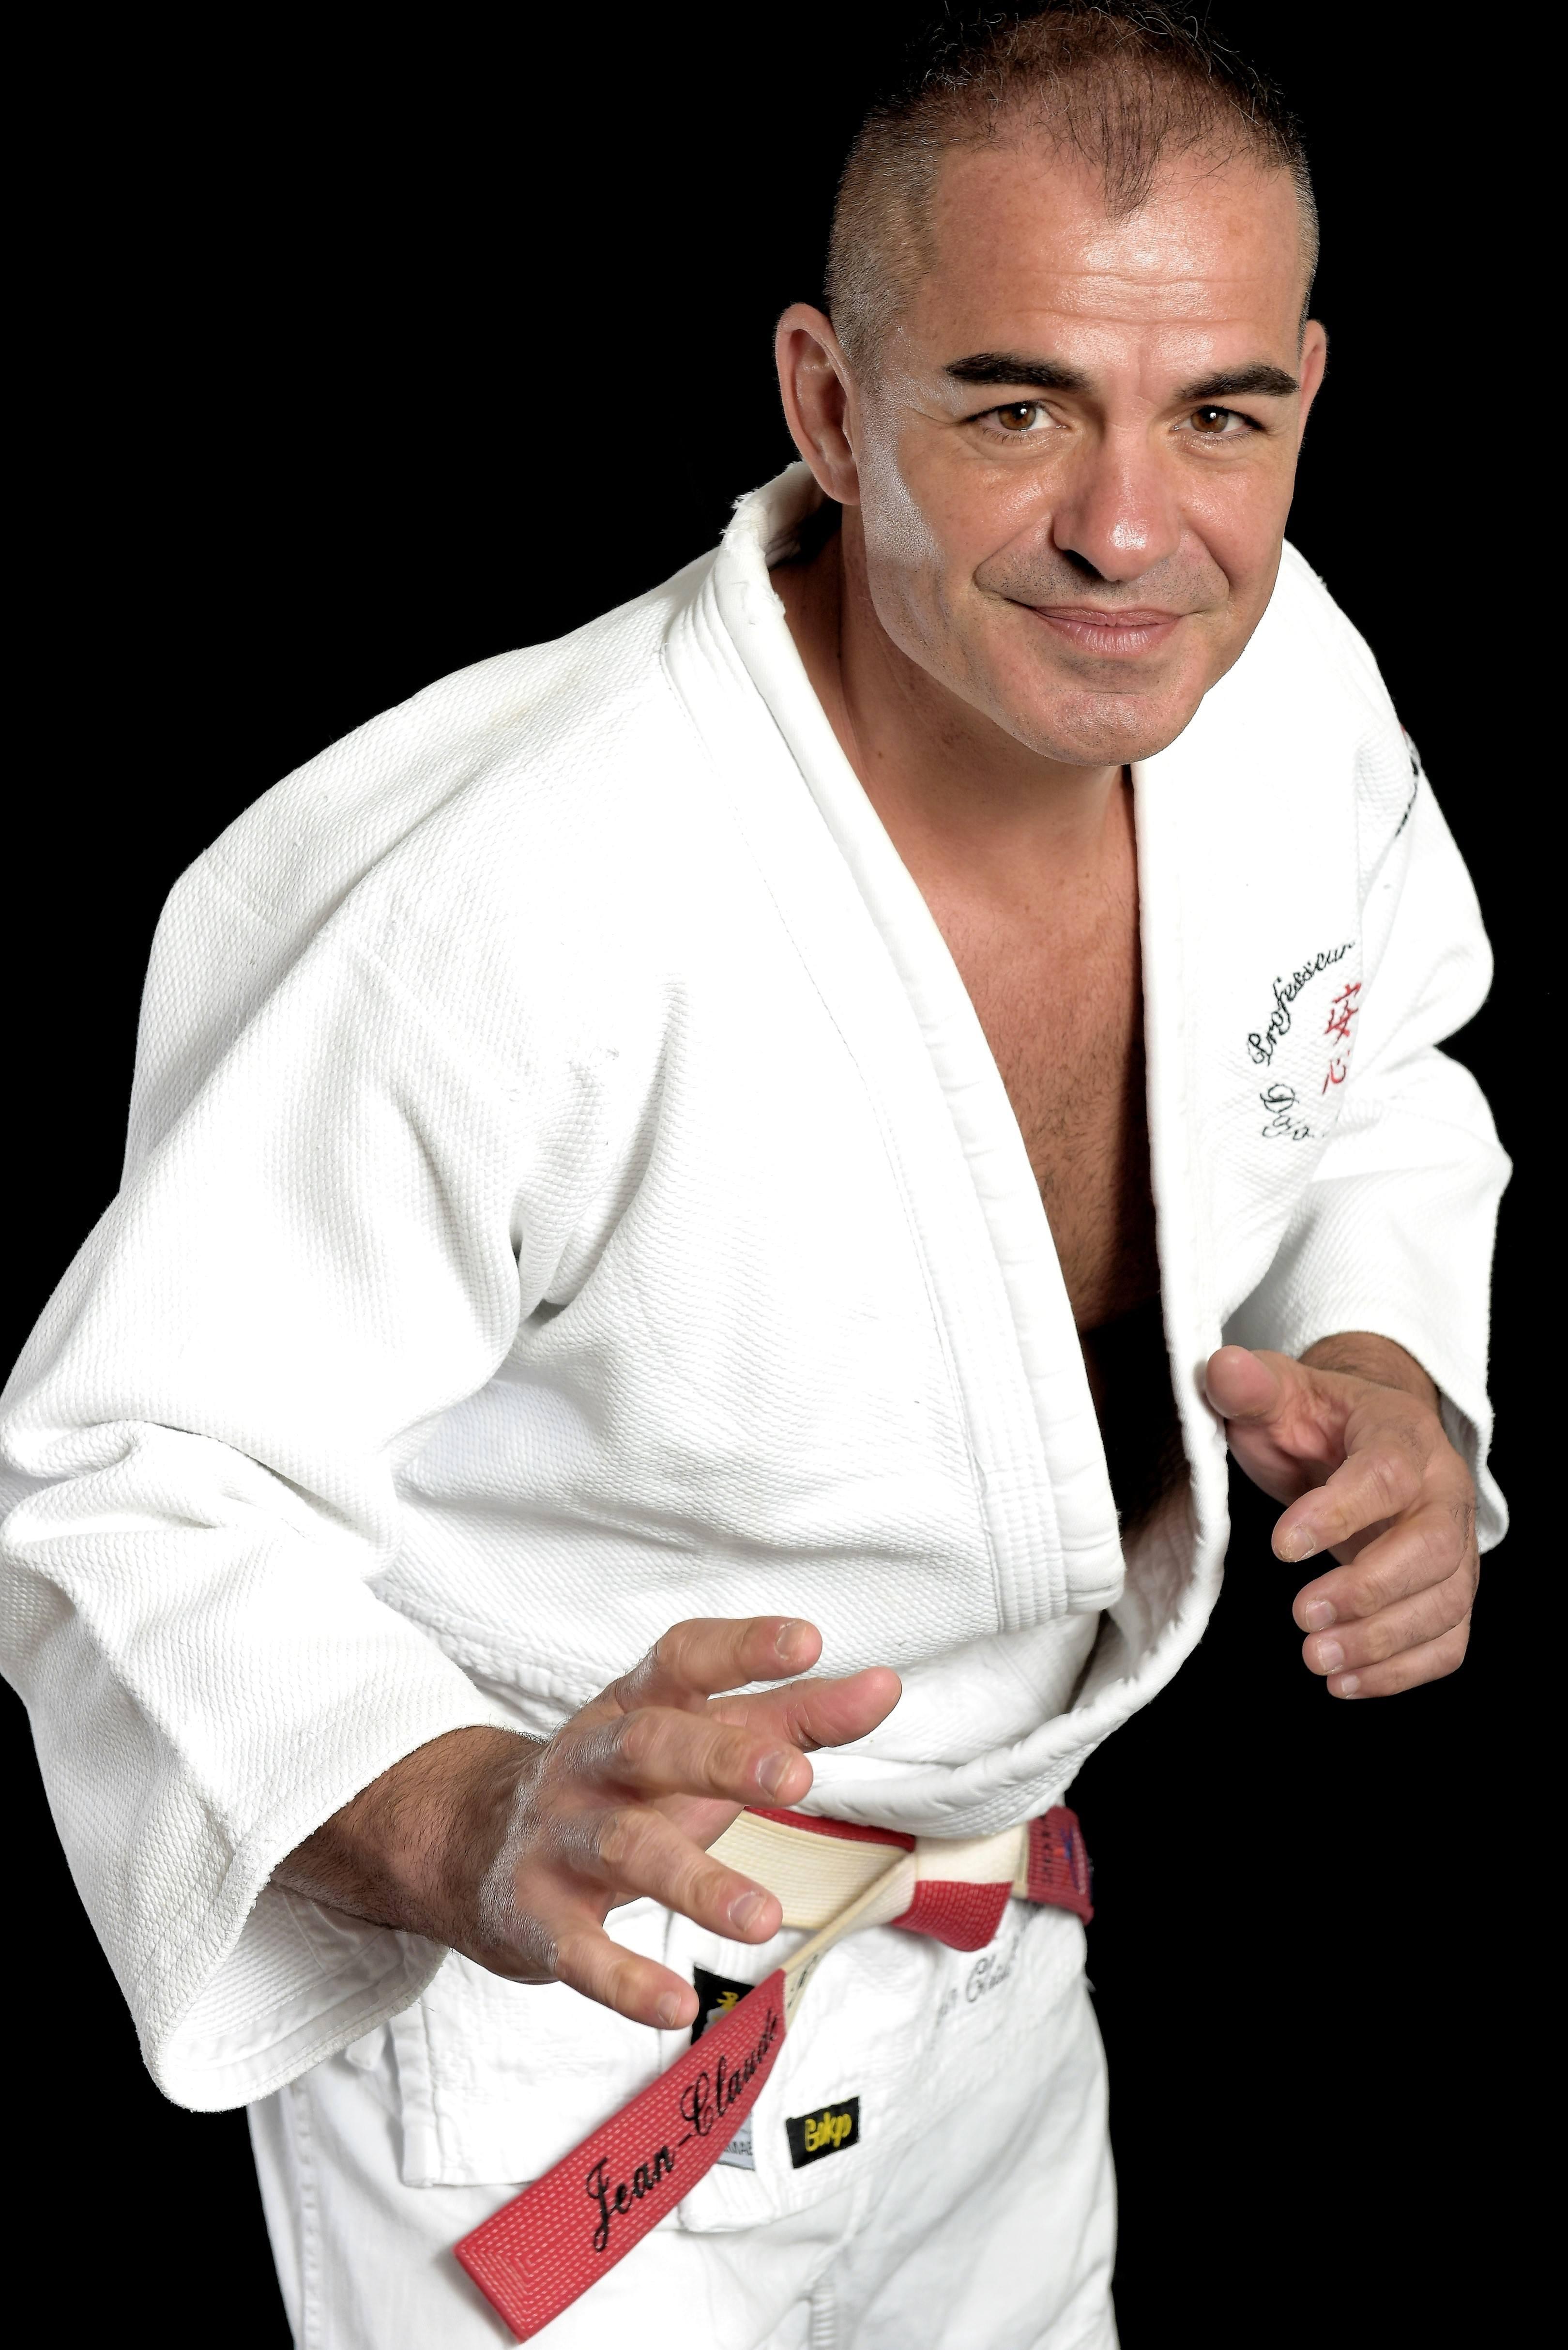 Jean-Claude Rieu, créateur de dojo en ligne et 6eme dan de judo jujitsu